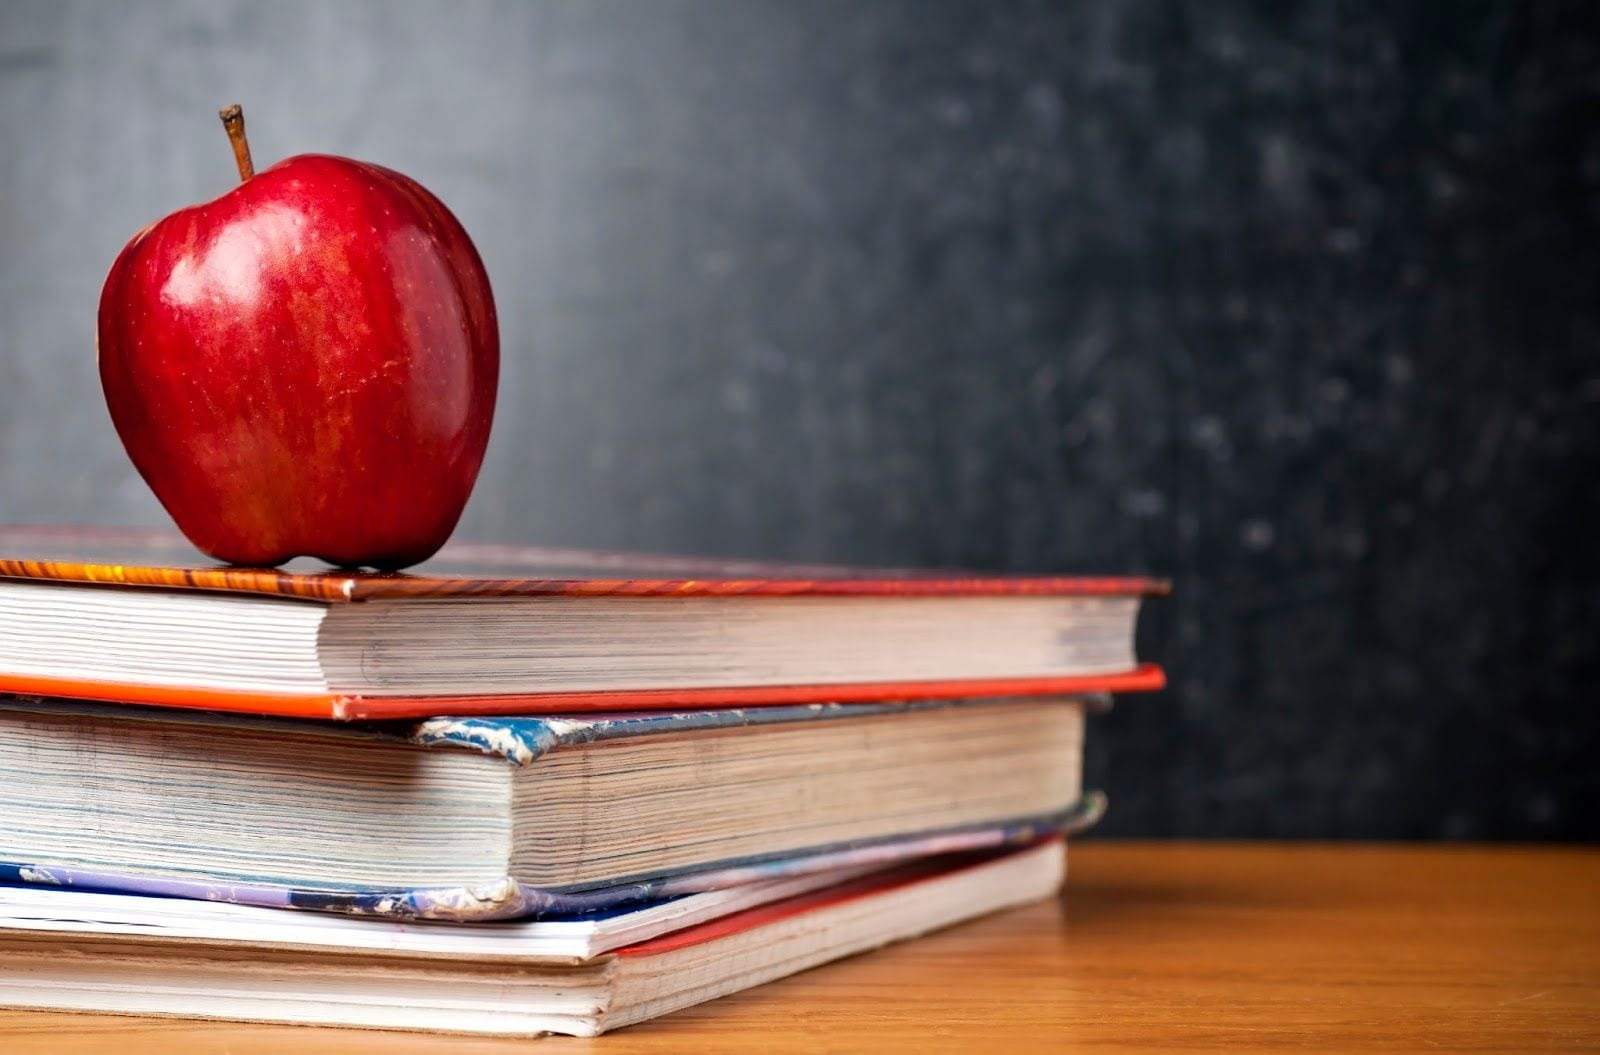 Case study: Education